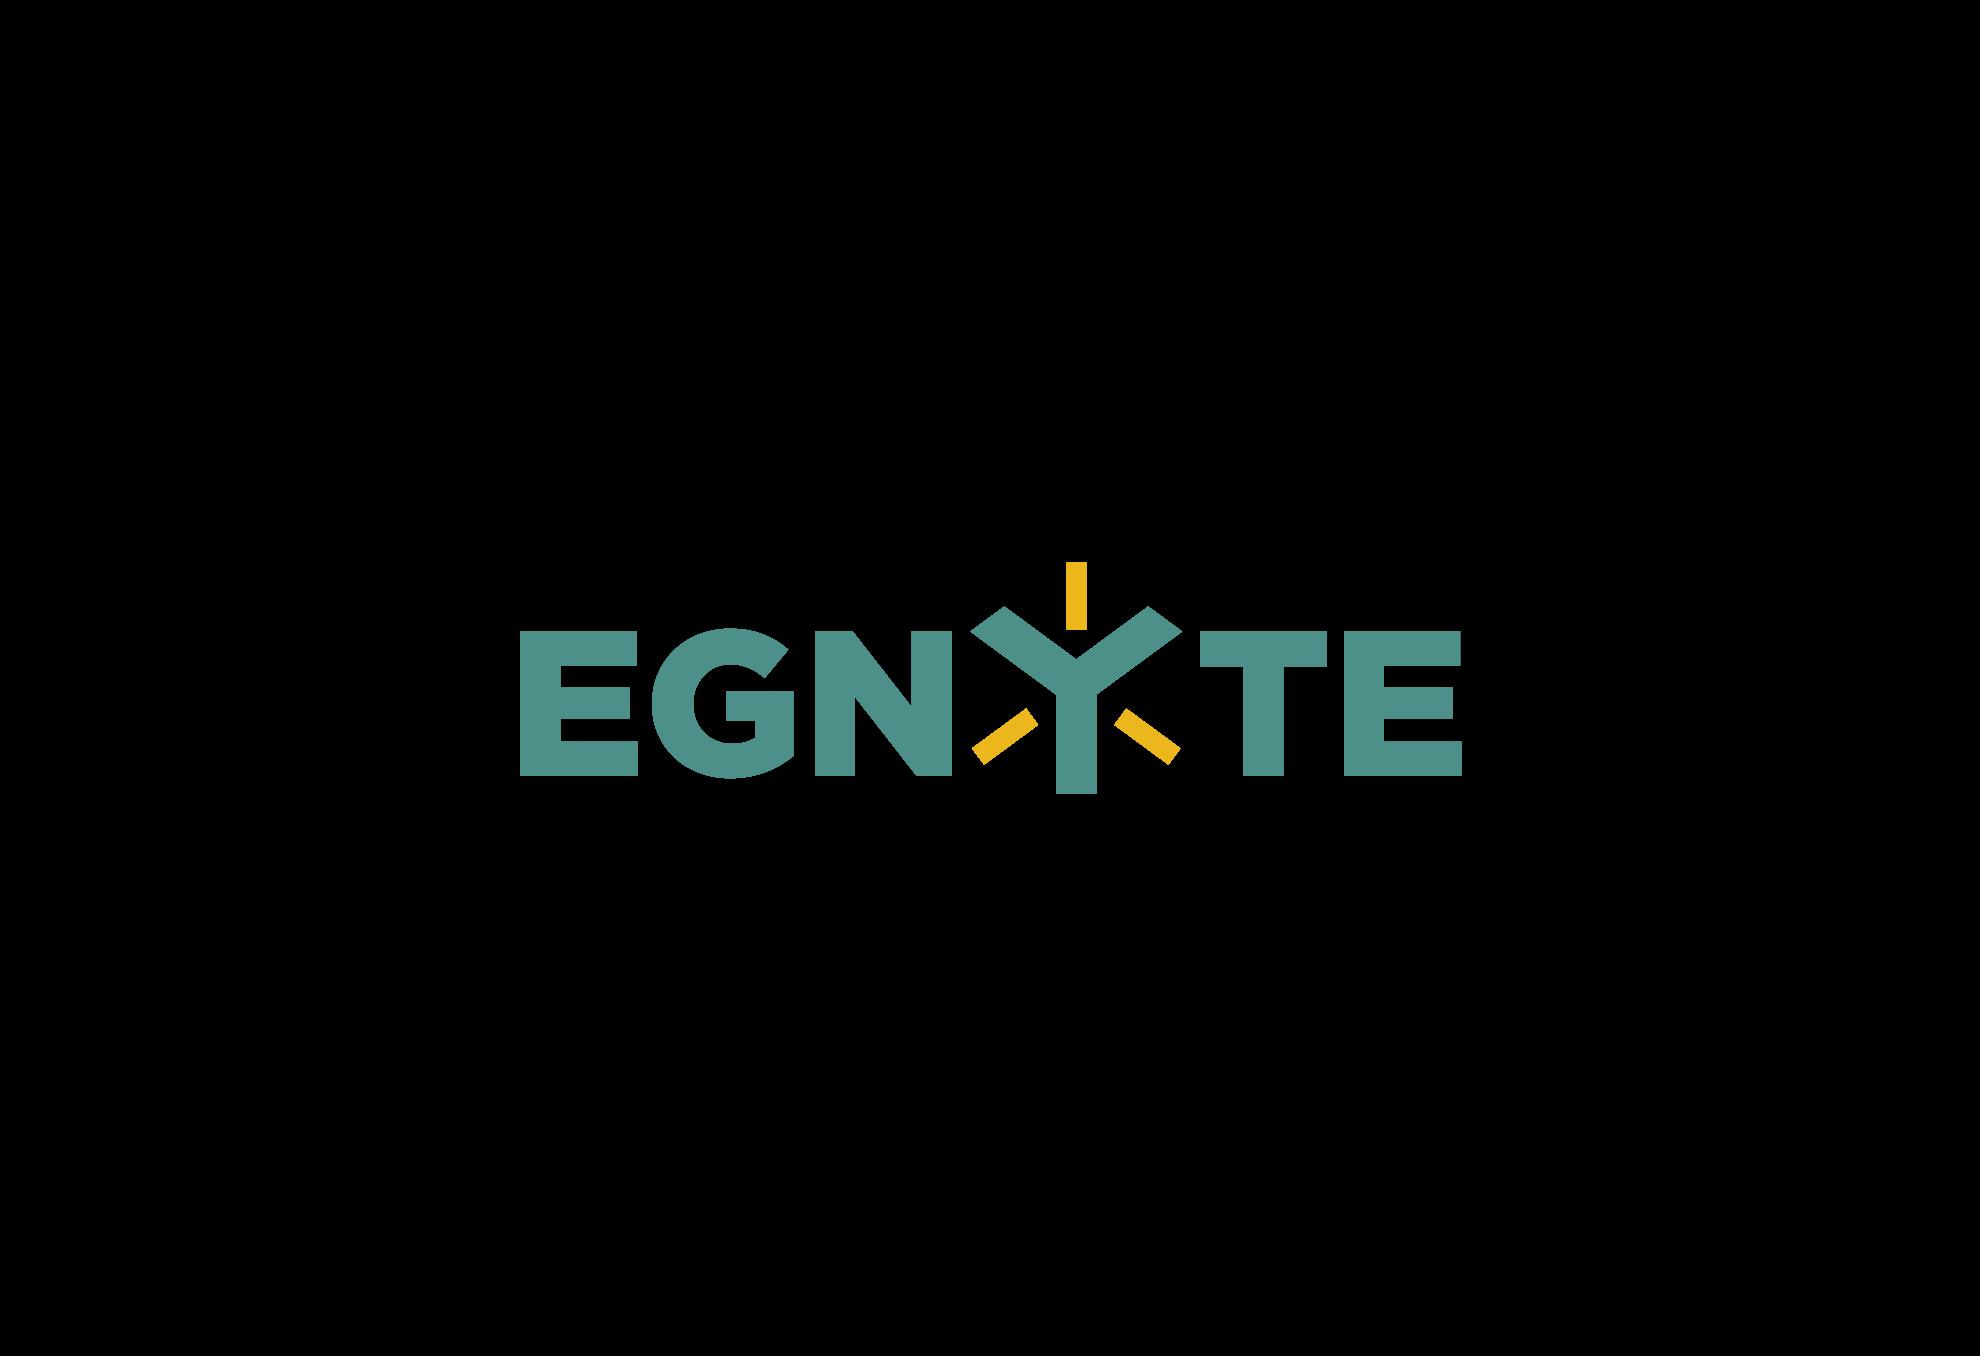 EGNYTE Identity Design